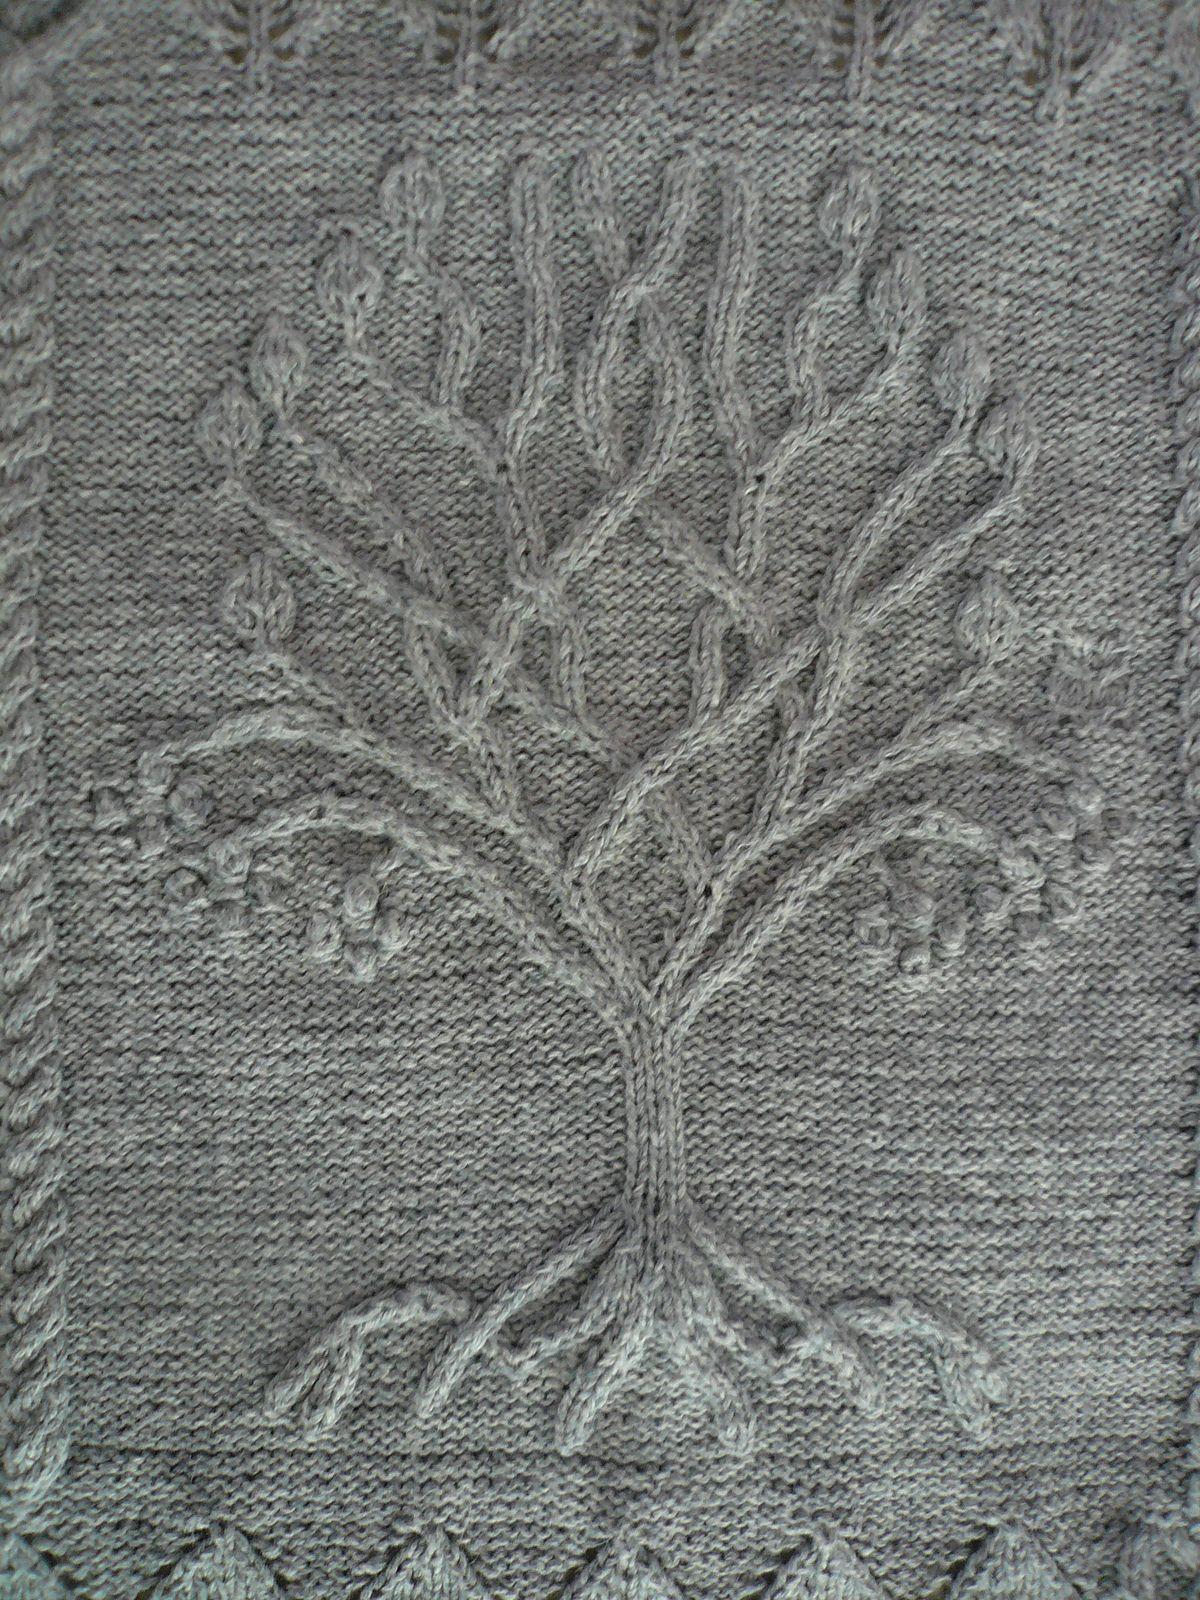 Ravelry tree pattern by ariel barton crochet hkovn knitting pattern ravelry project gallery for tree pattern by ariel barton free knitting pattern bankloansurffo Choice Image